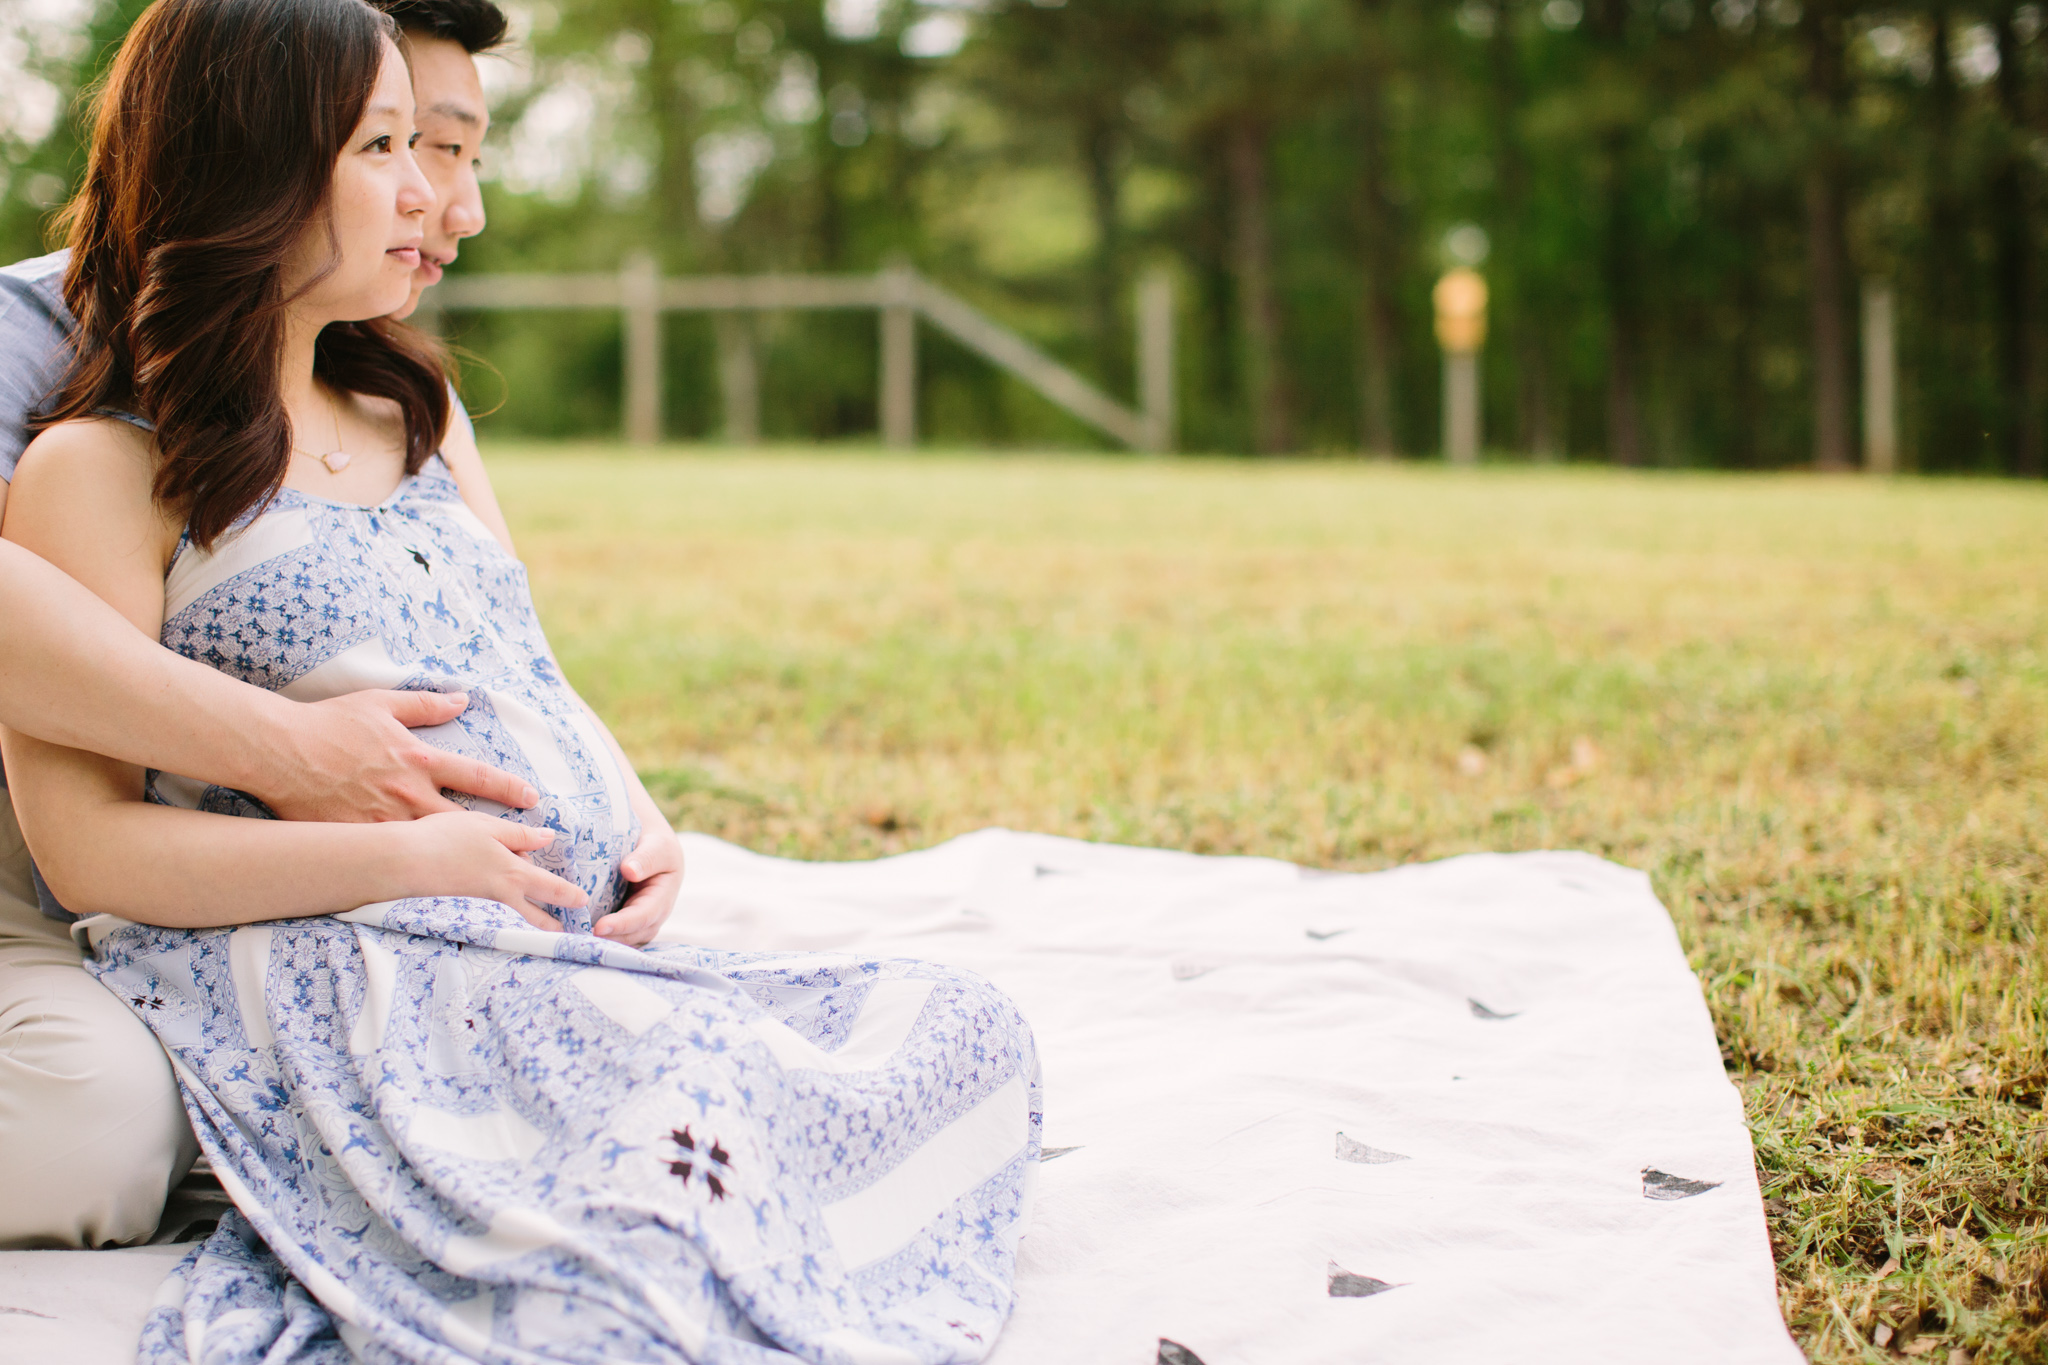 ginachris_maternity_web_26.jpg